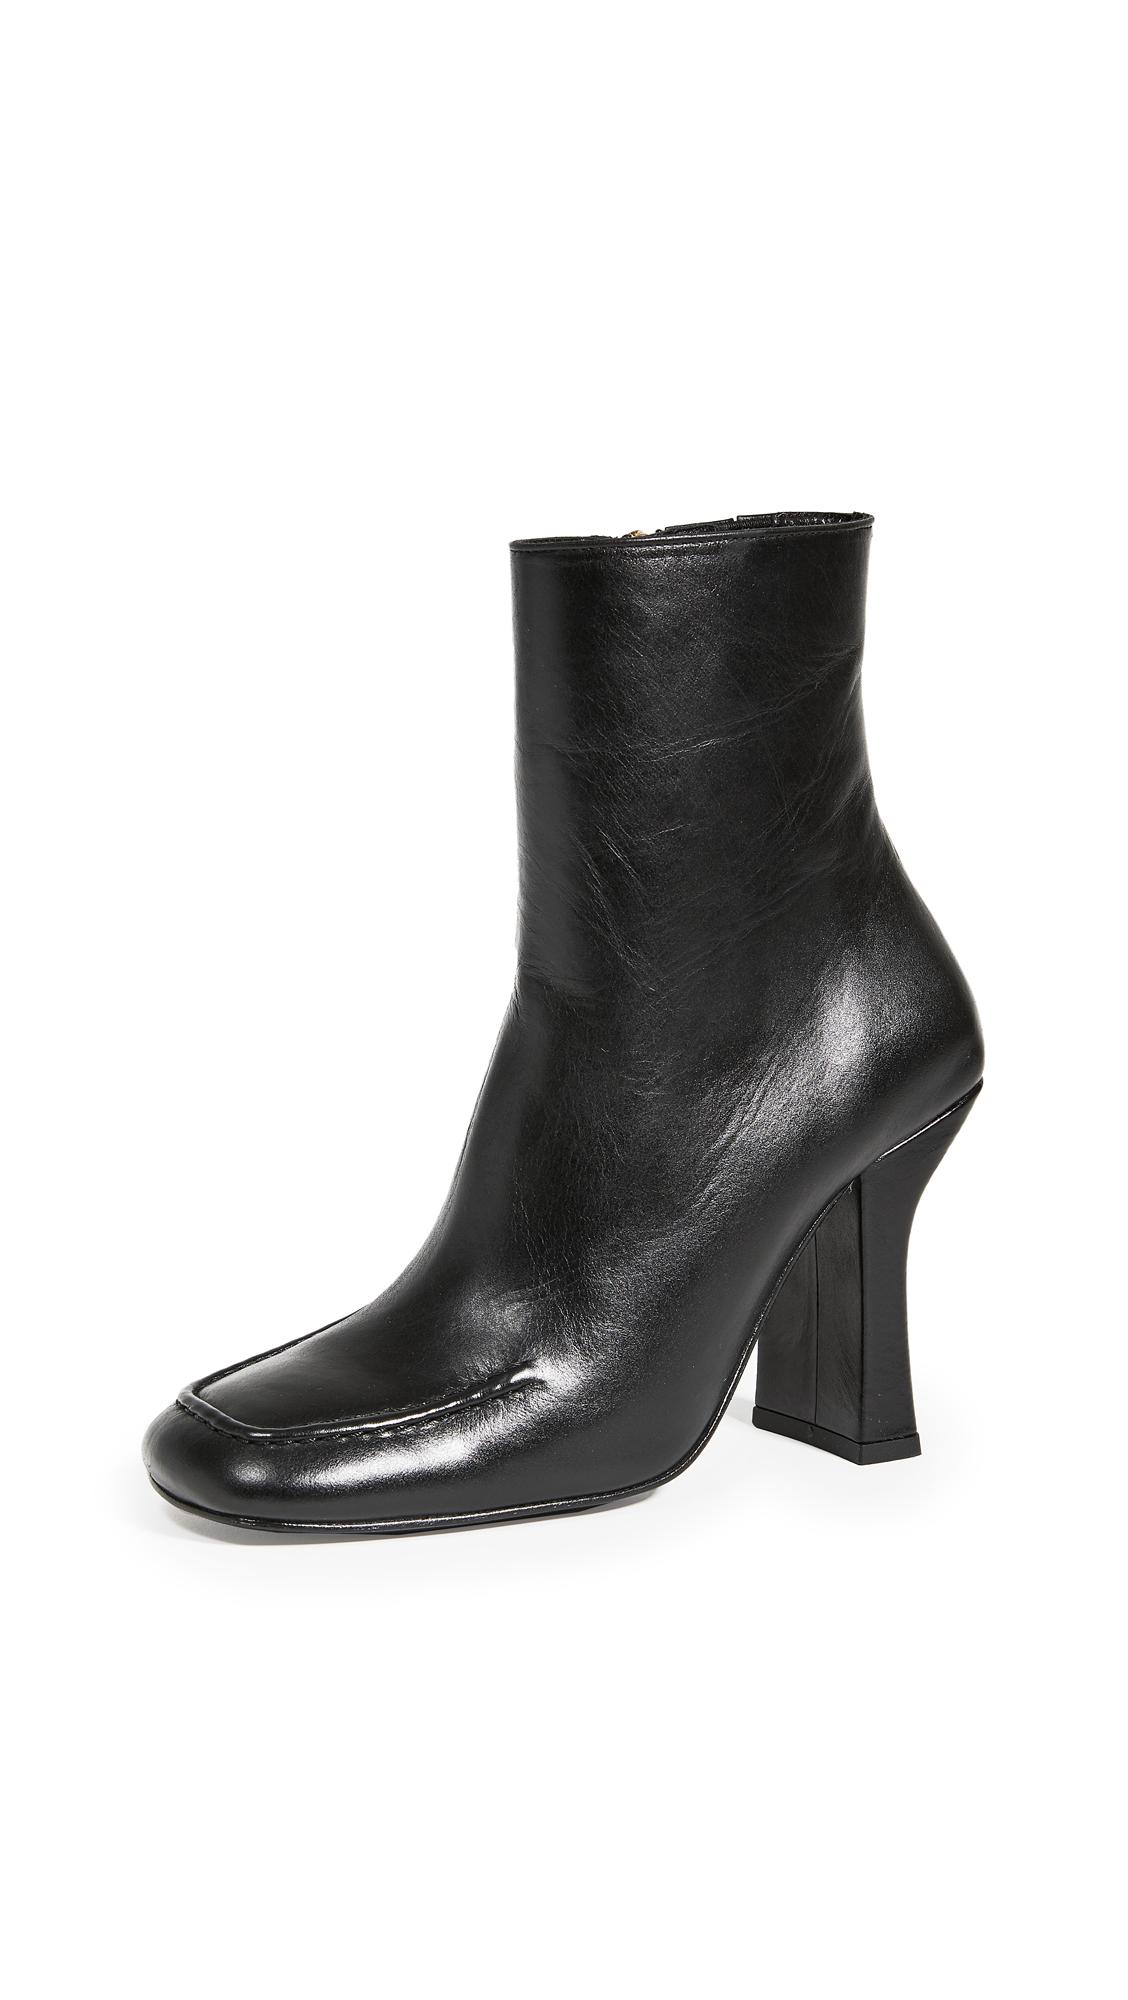 Buy Dorateymur Retox Boots online, shop Dorateymur